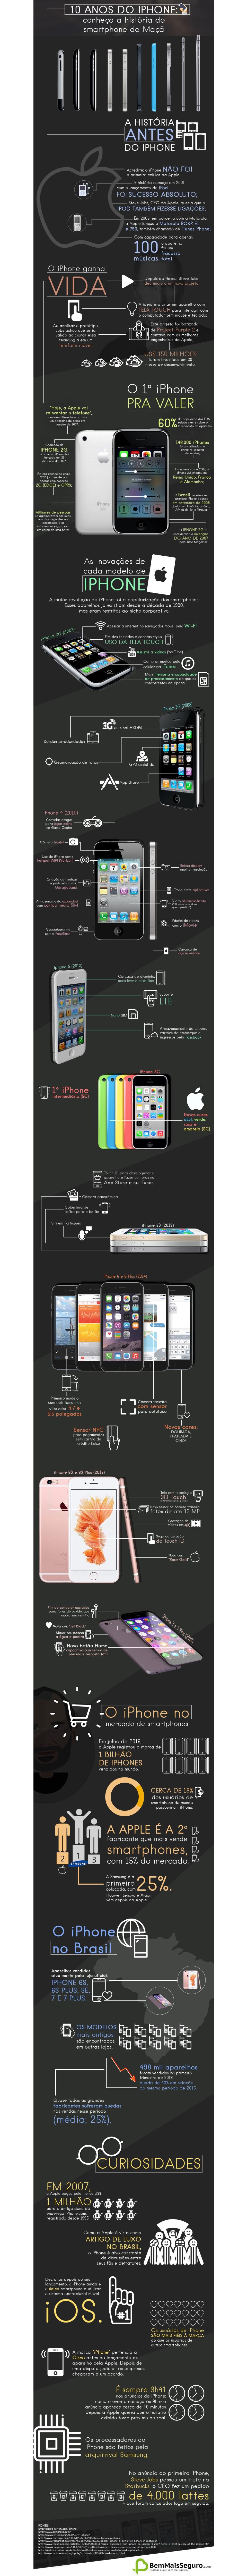 10 anos do iPhone: confira tudo sobre o celular que revolucionou o mercado